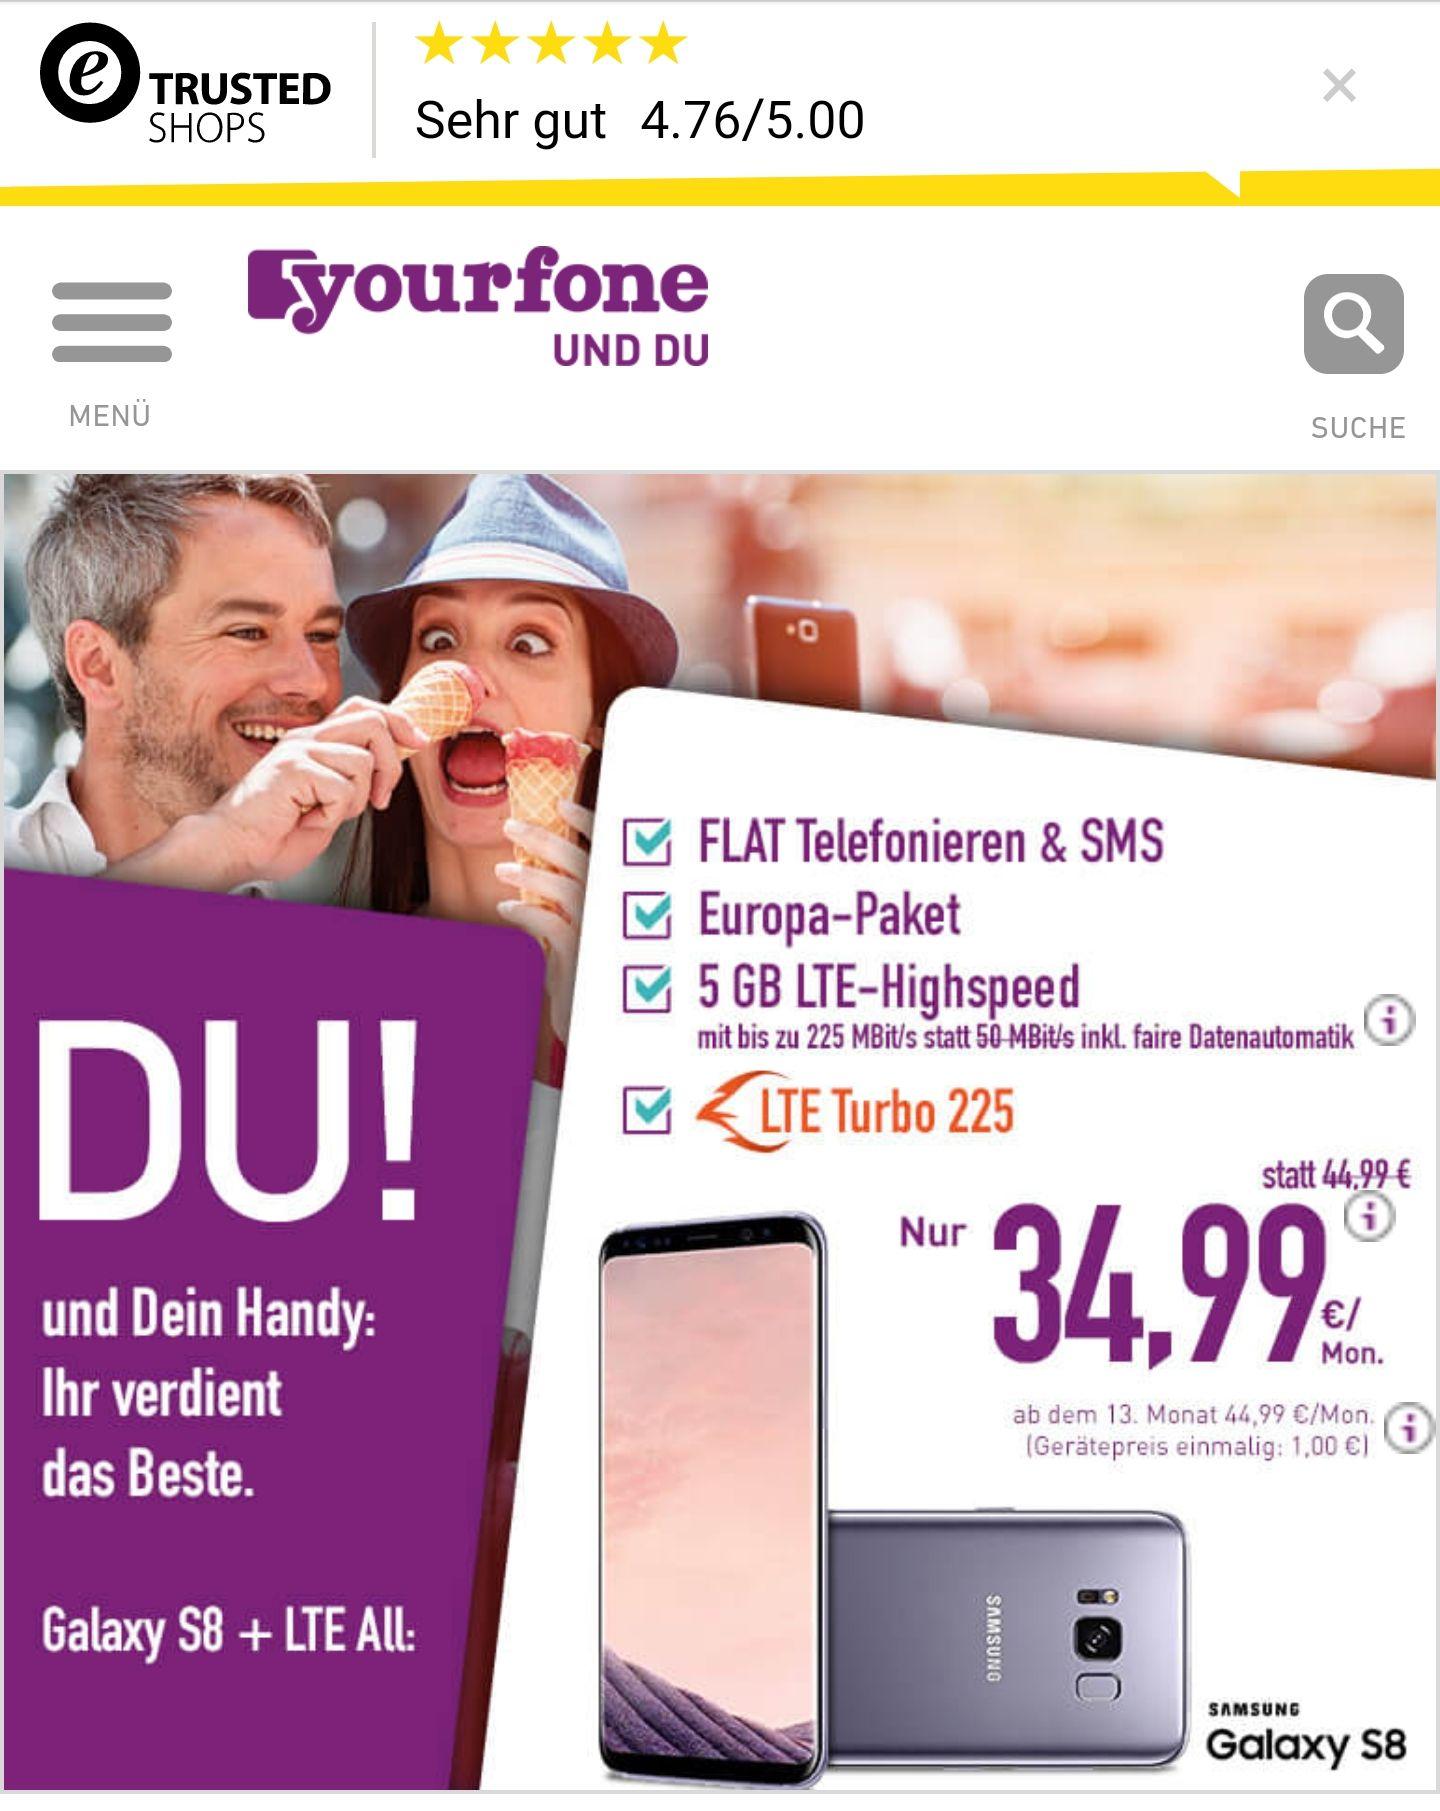 LTE All+Samsung Galaxy S8  1€ 6 GB LTE Turbo